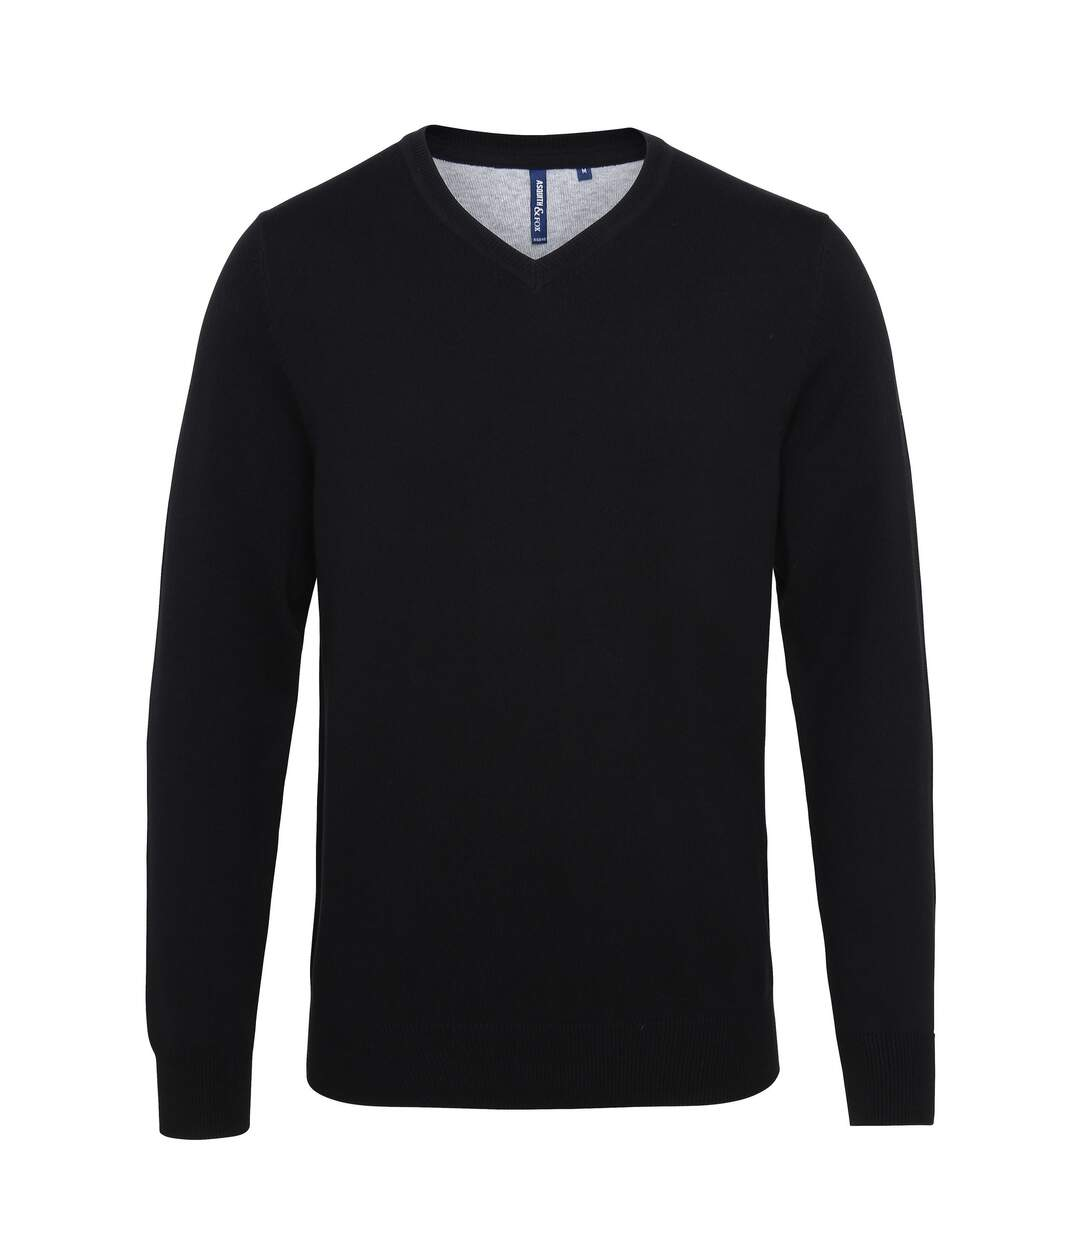 Asquith & Fox Mens Cotton Rich V-Neck Sweater (Black) - UTRW5188